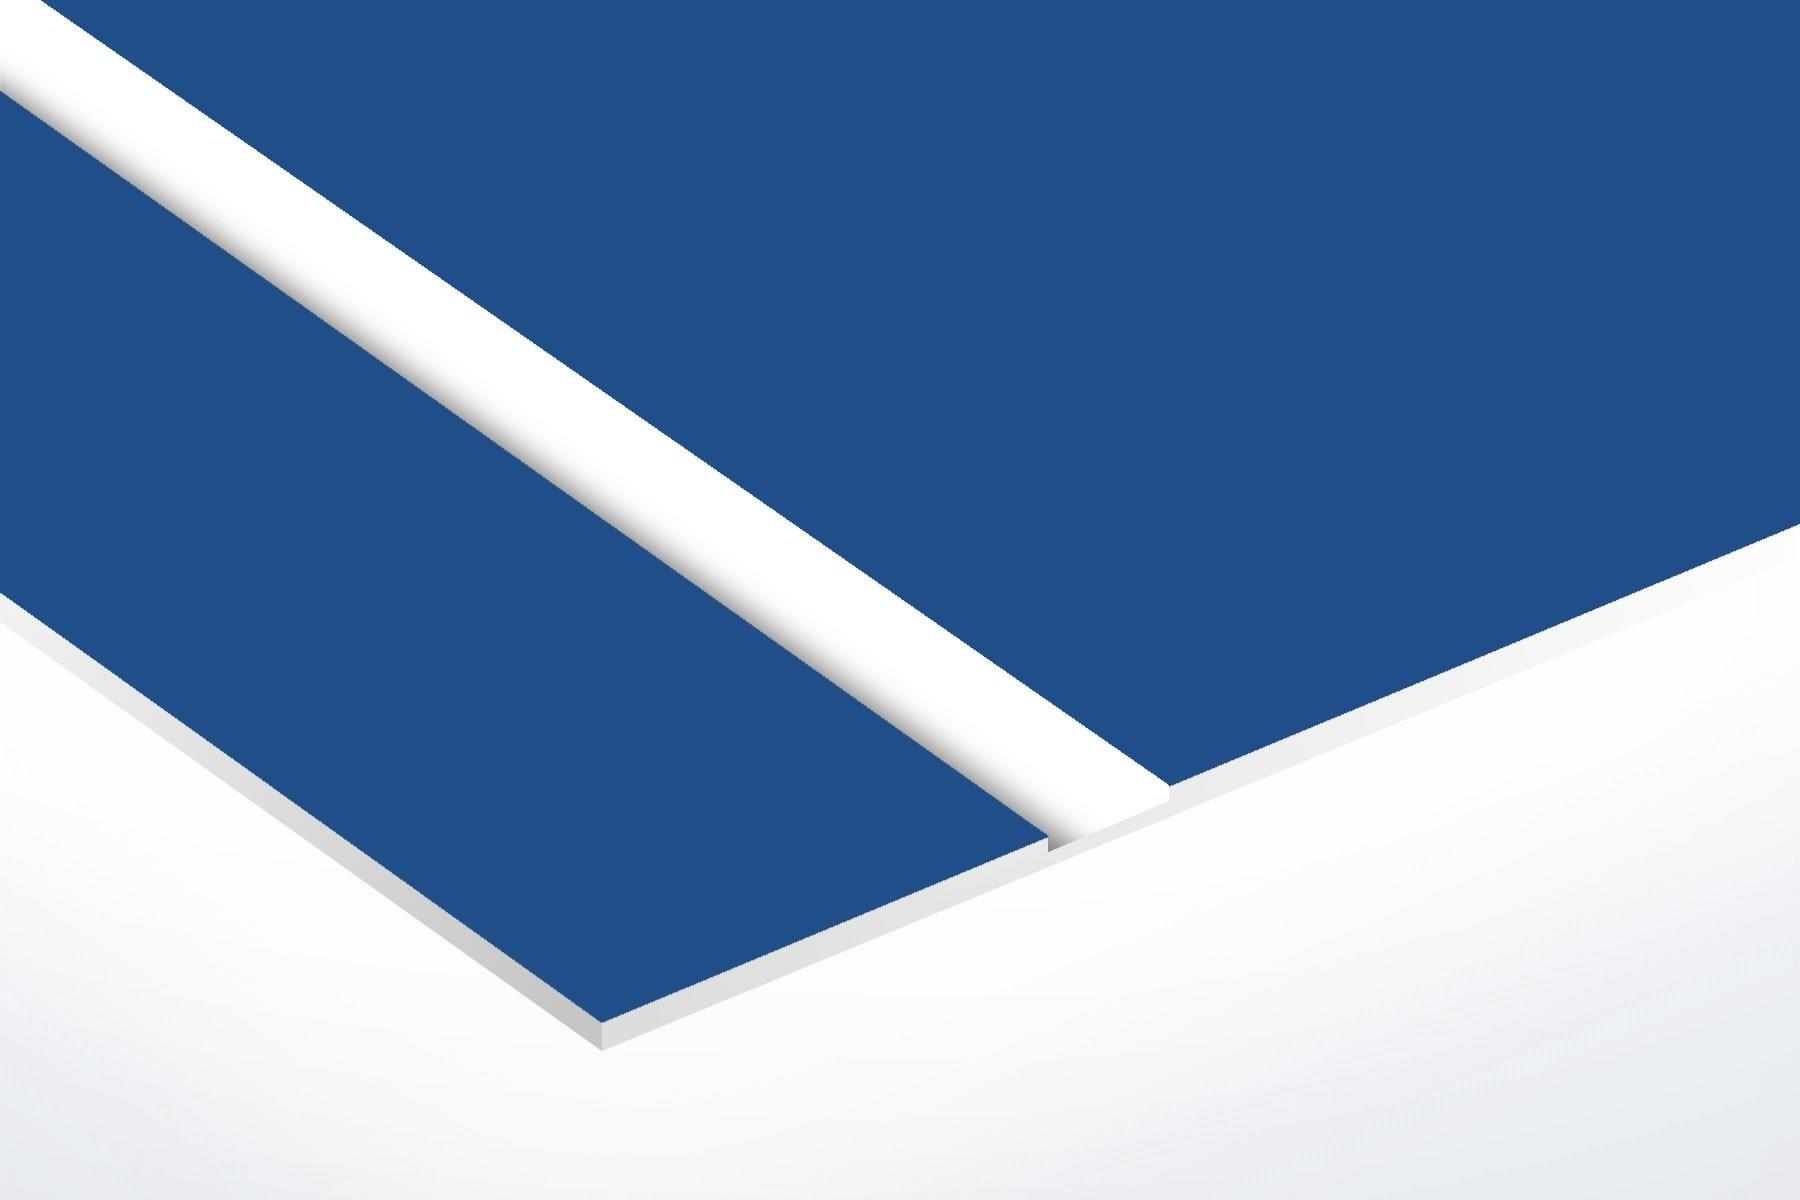 TroLase Lights,BlueBerry/White, 2ply, 0.1 mm